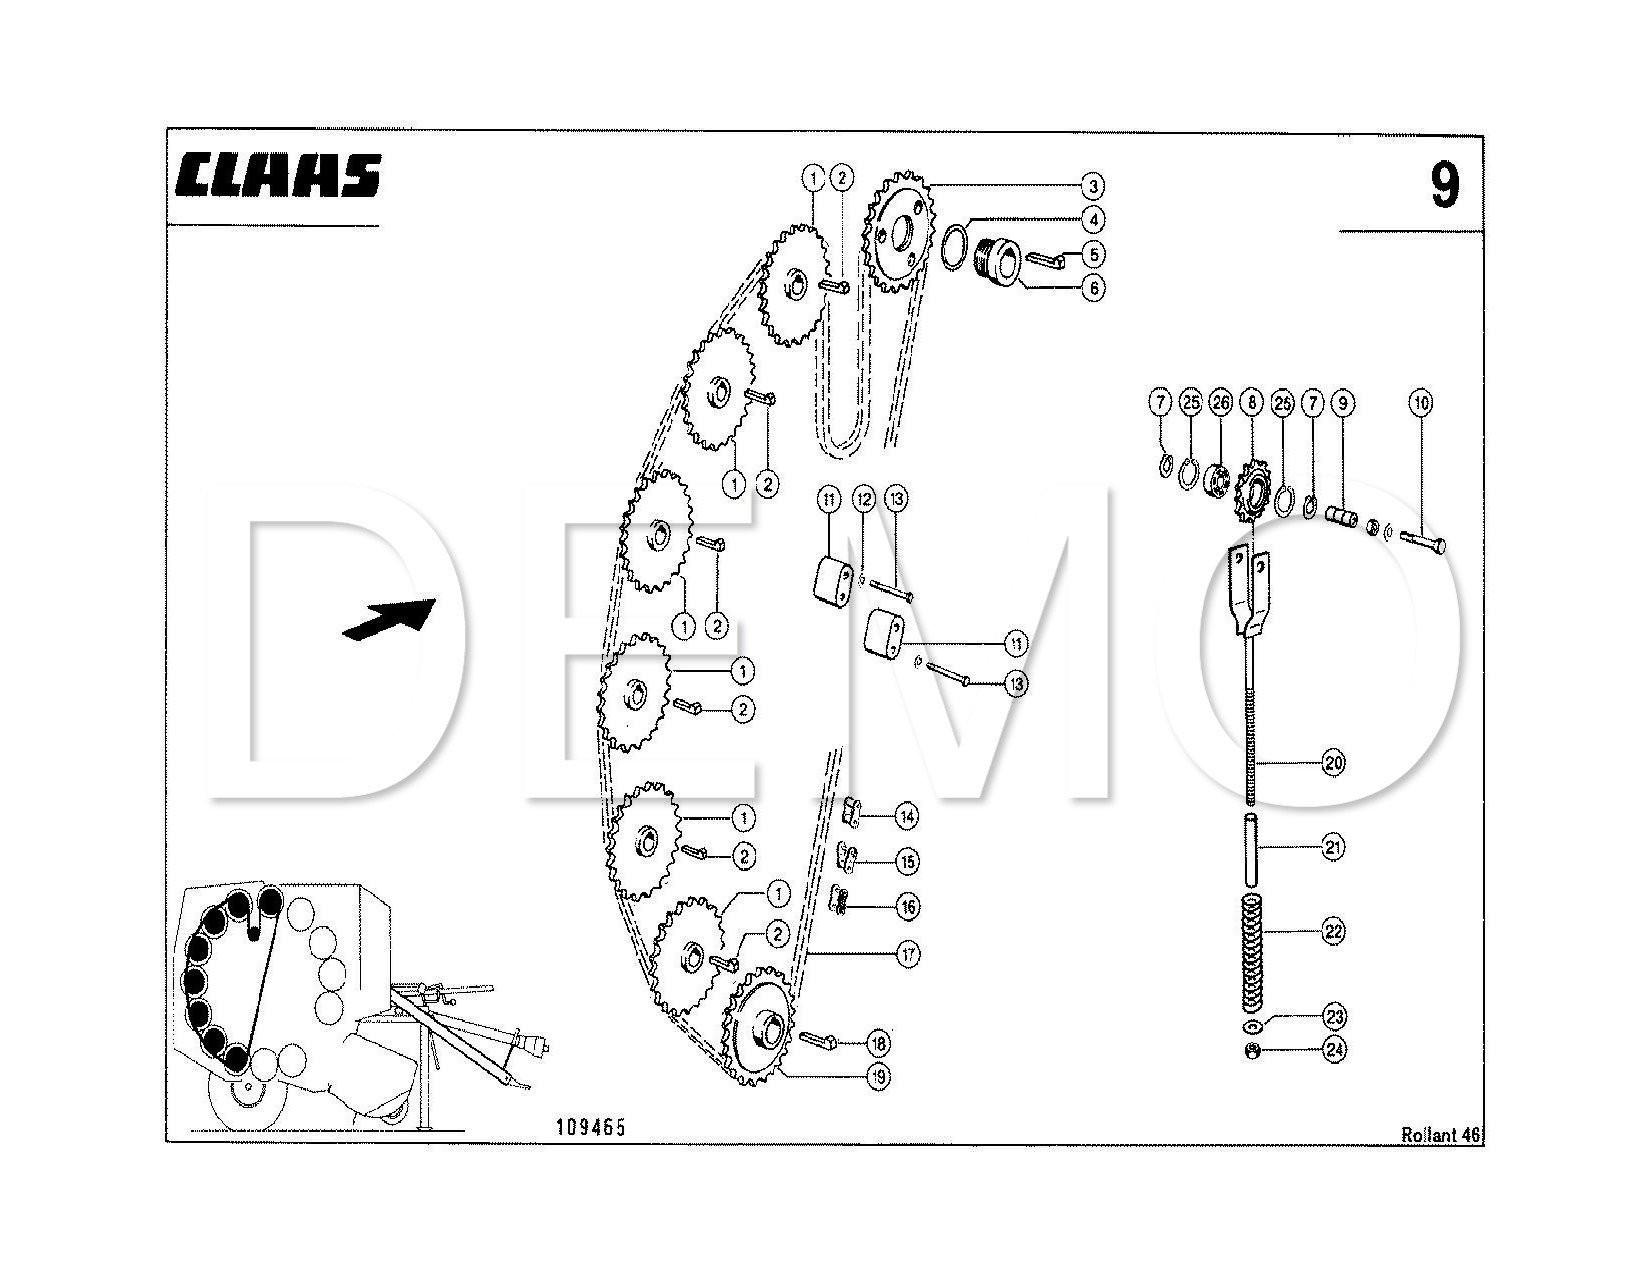 car parts diagram pdf claas rollant 340 parts catalogue